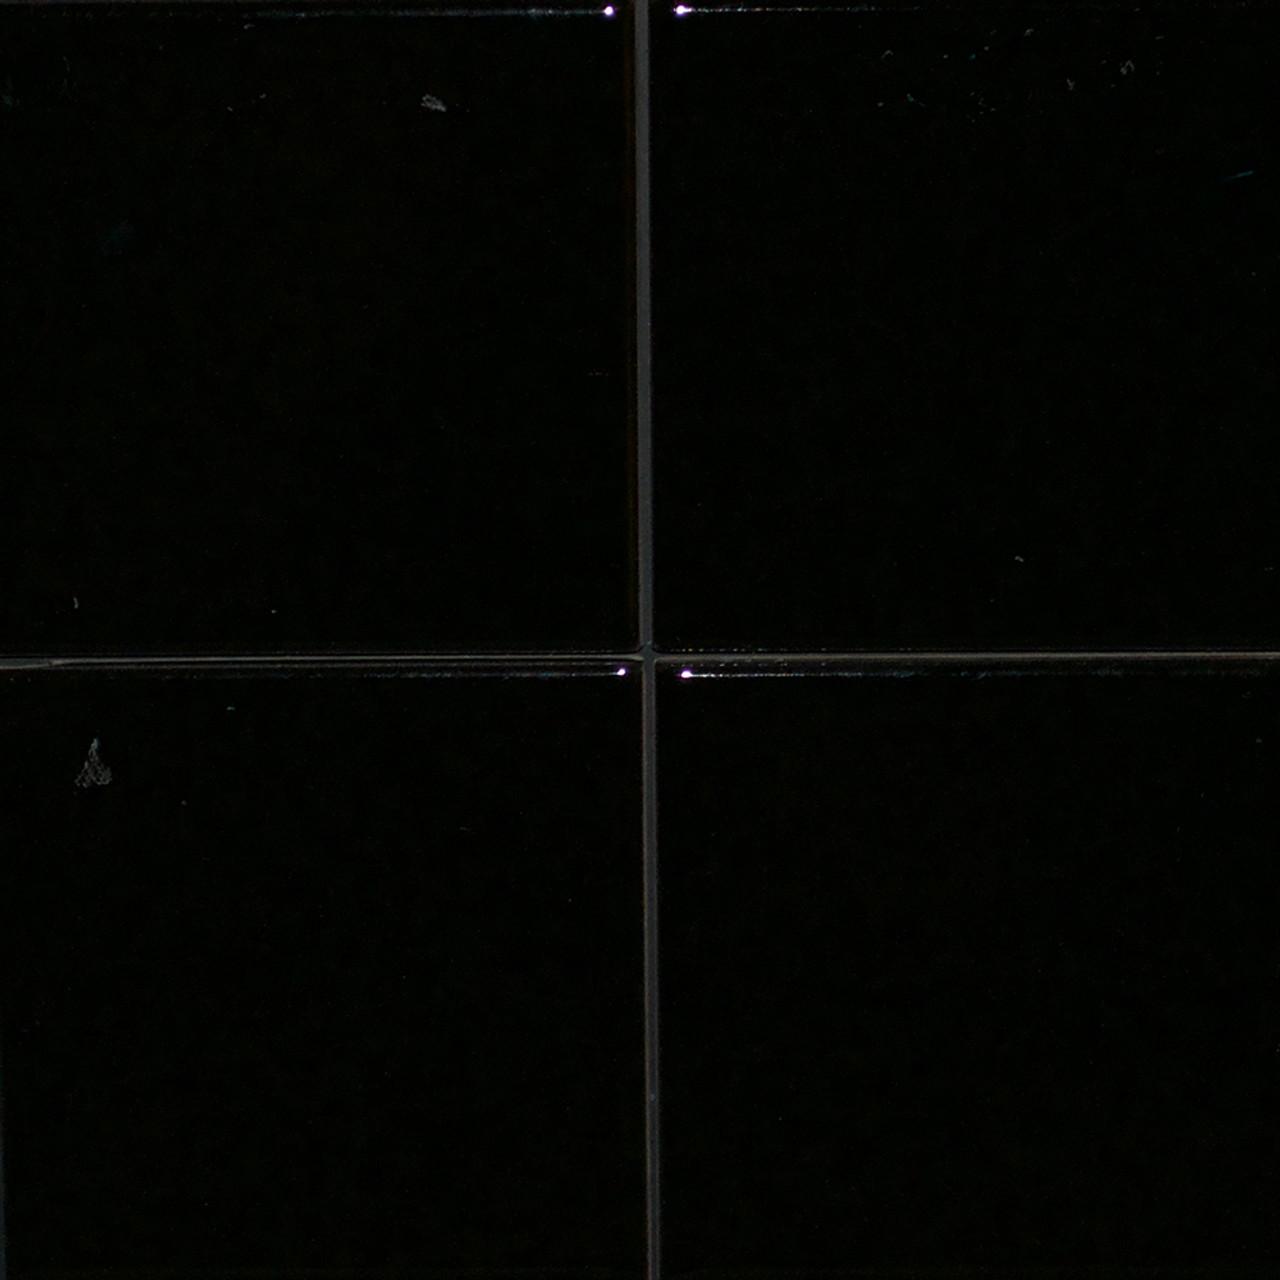 retro negro brillo tile 10cm x 10cm was 30 sqm now 9 sqm